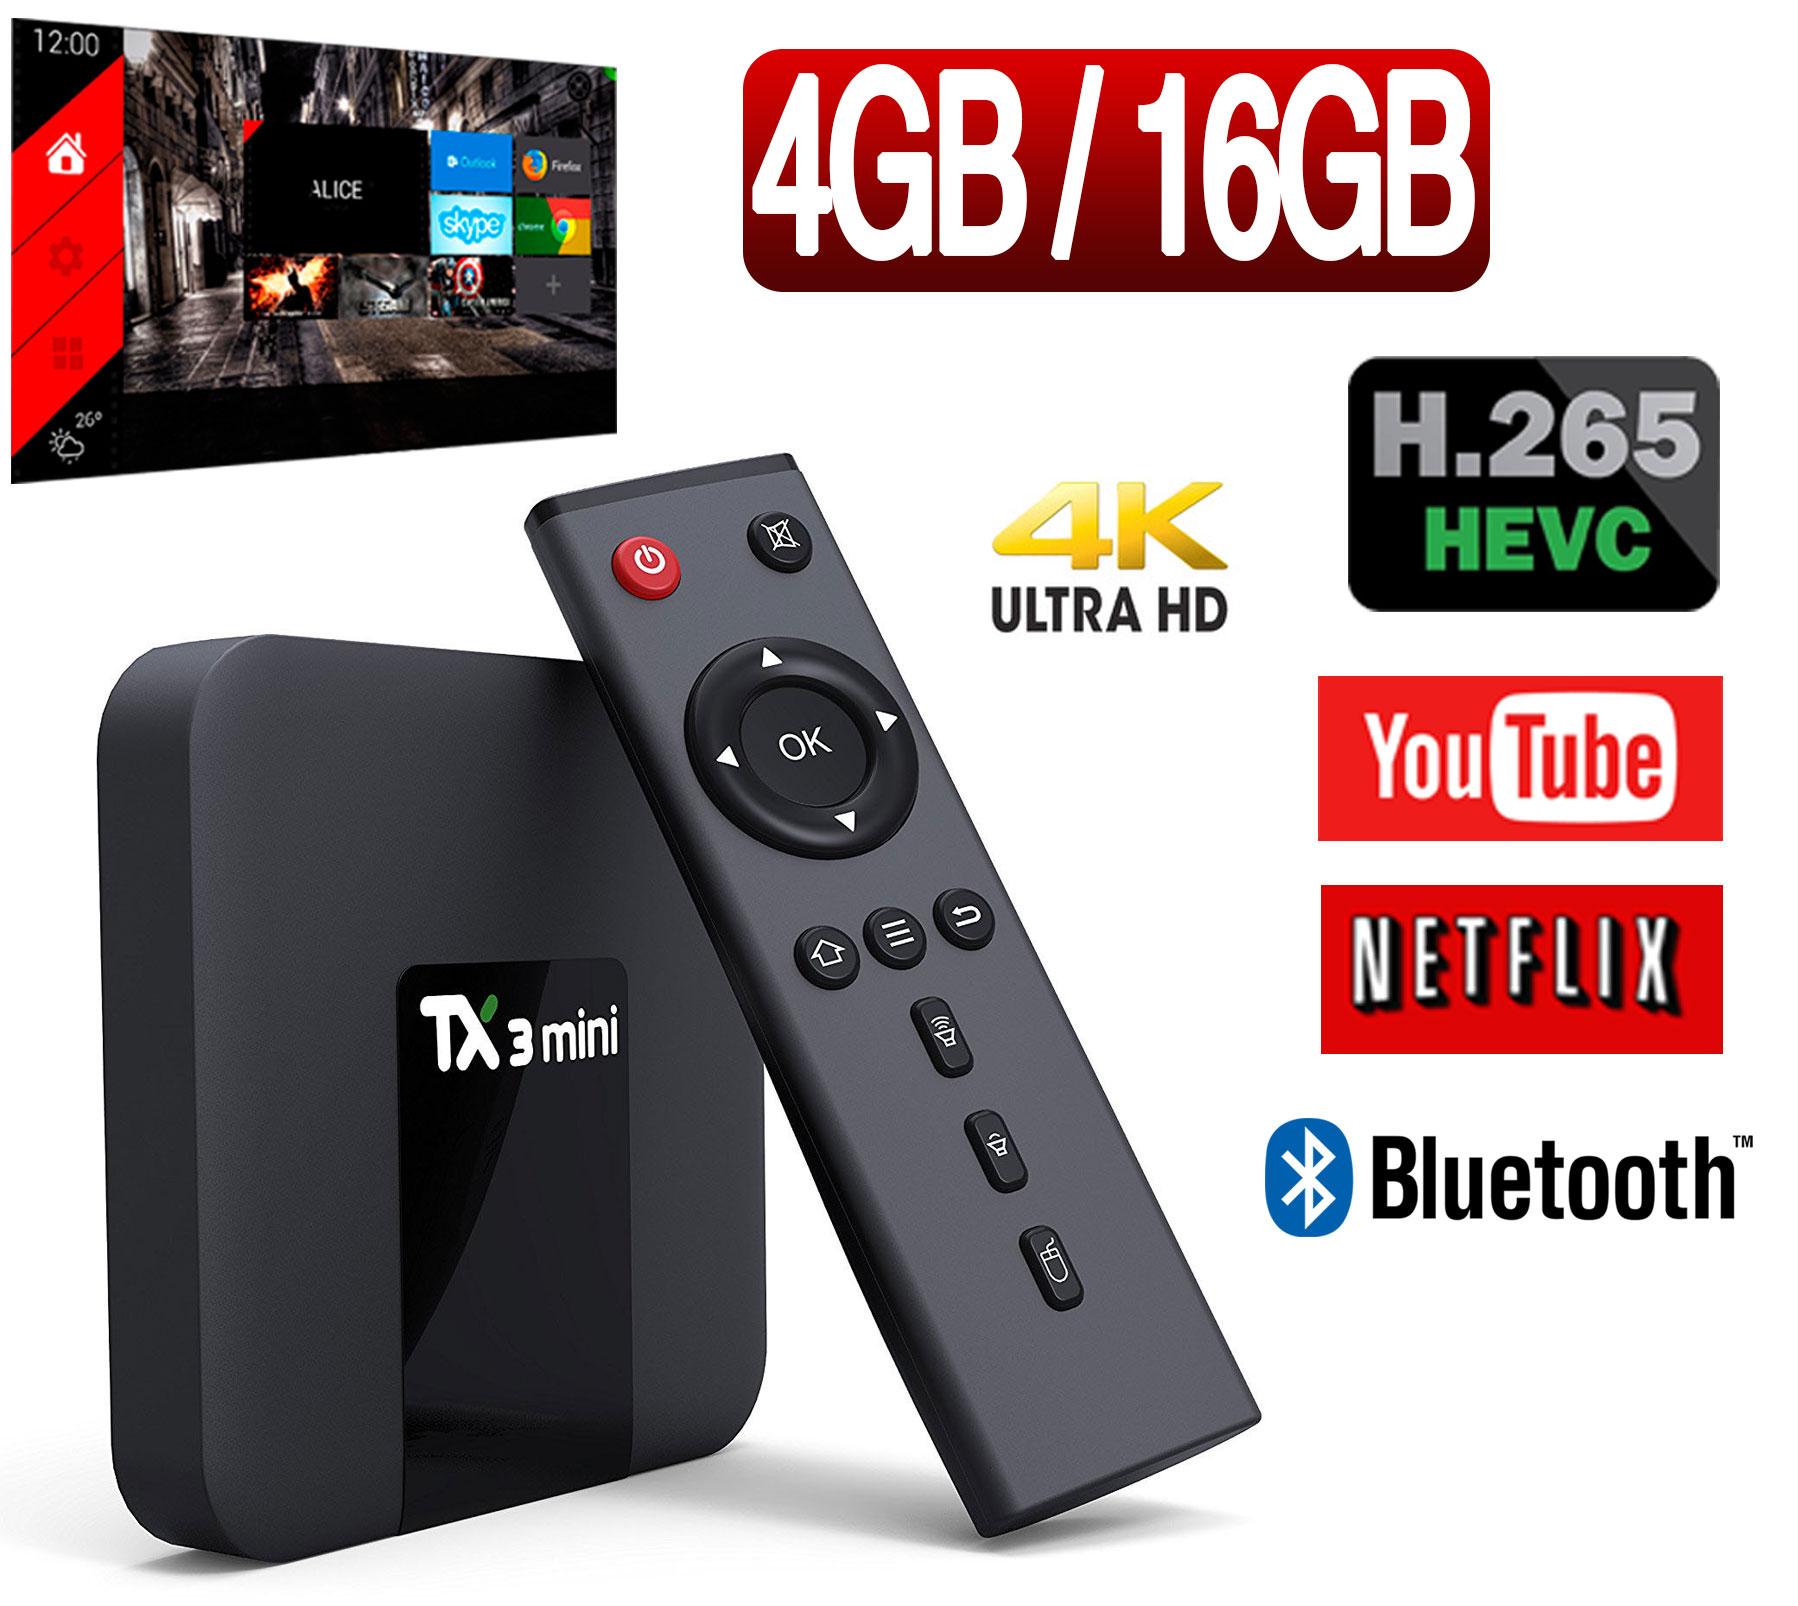 Tv Box TX3 YOUIT OCTACORE 4GB/16GB com BLUETOOTH E ALICE UX - CONFIGURADA